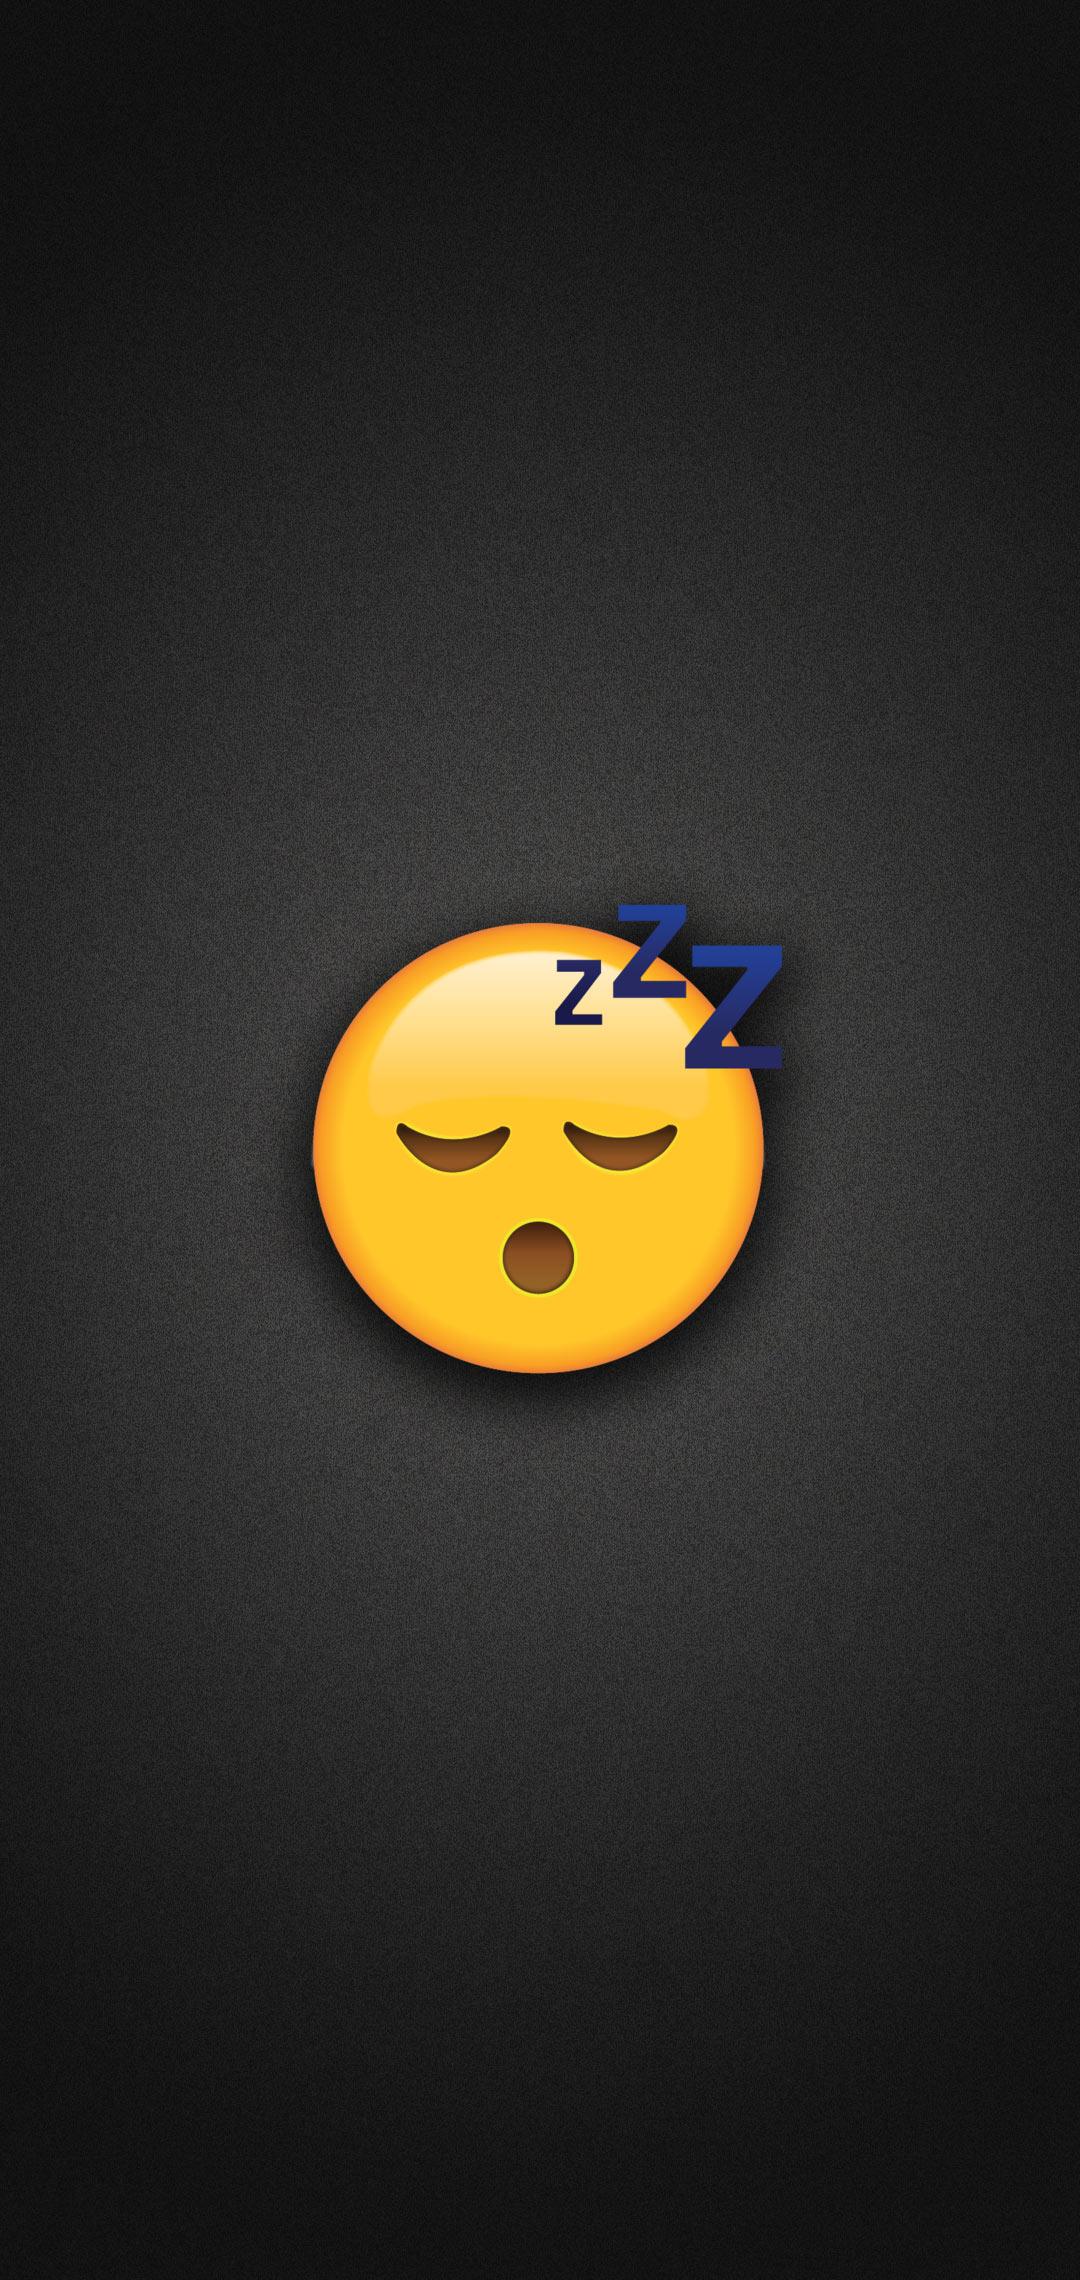 Sleeping Emoji Phone Wallpaper 1080x2280